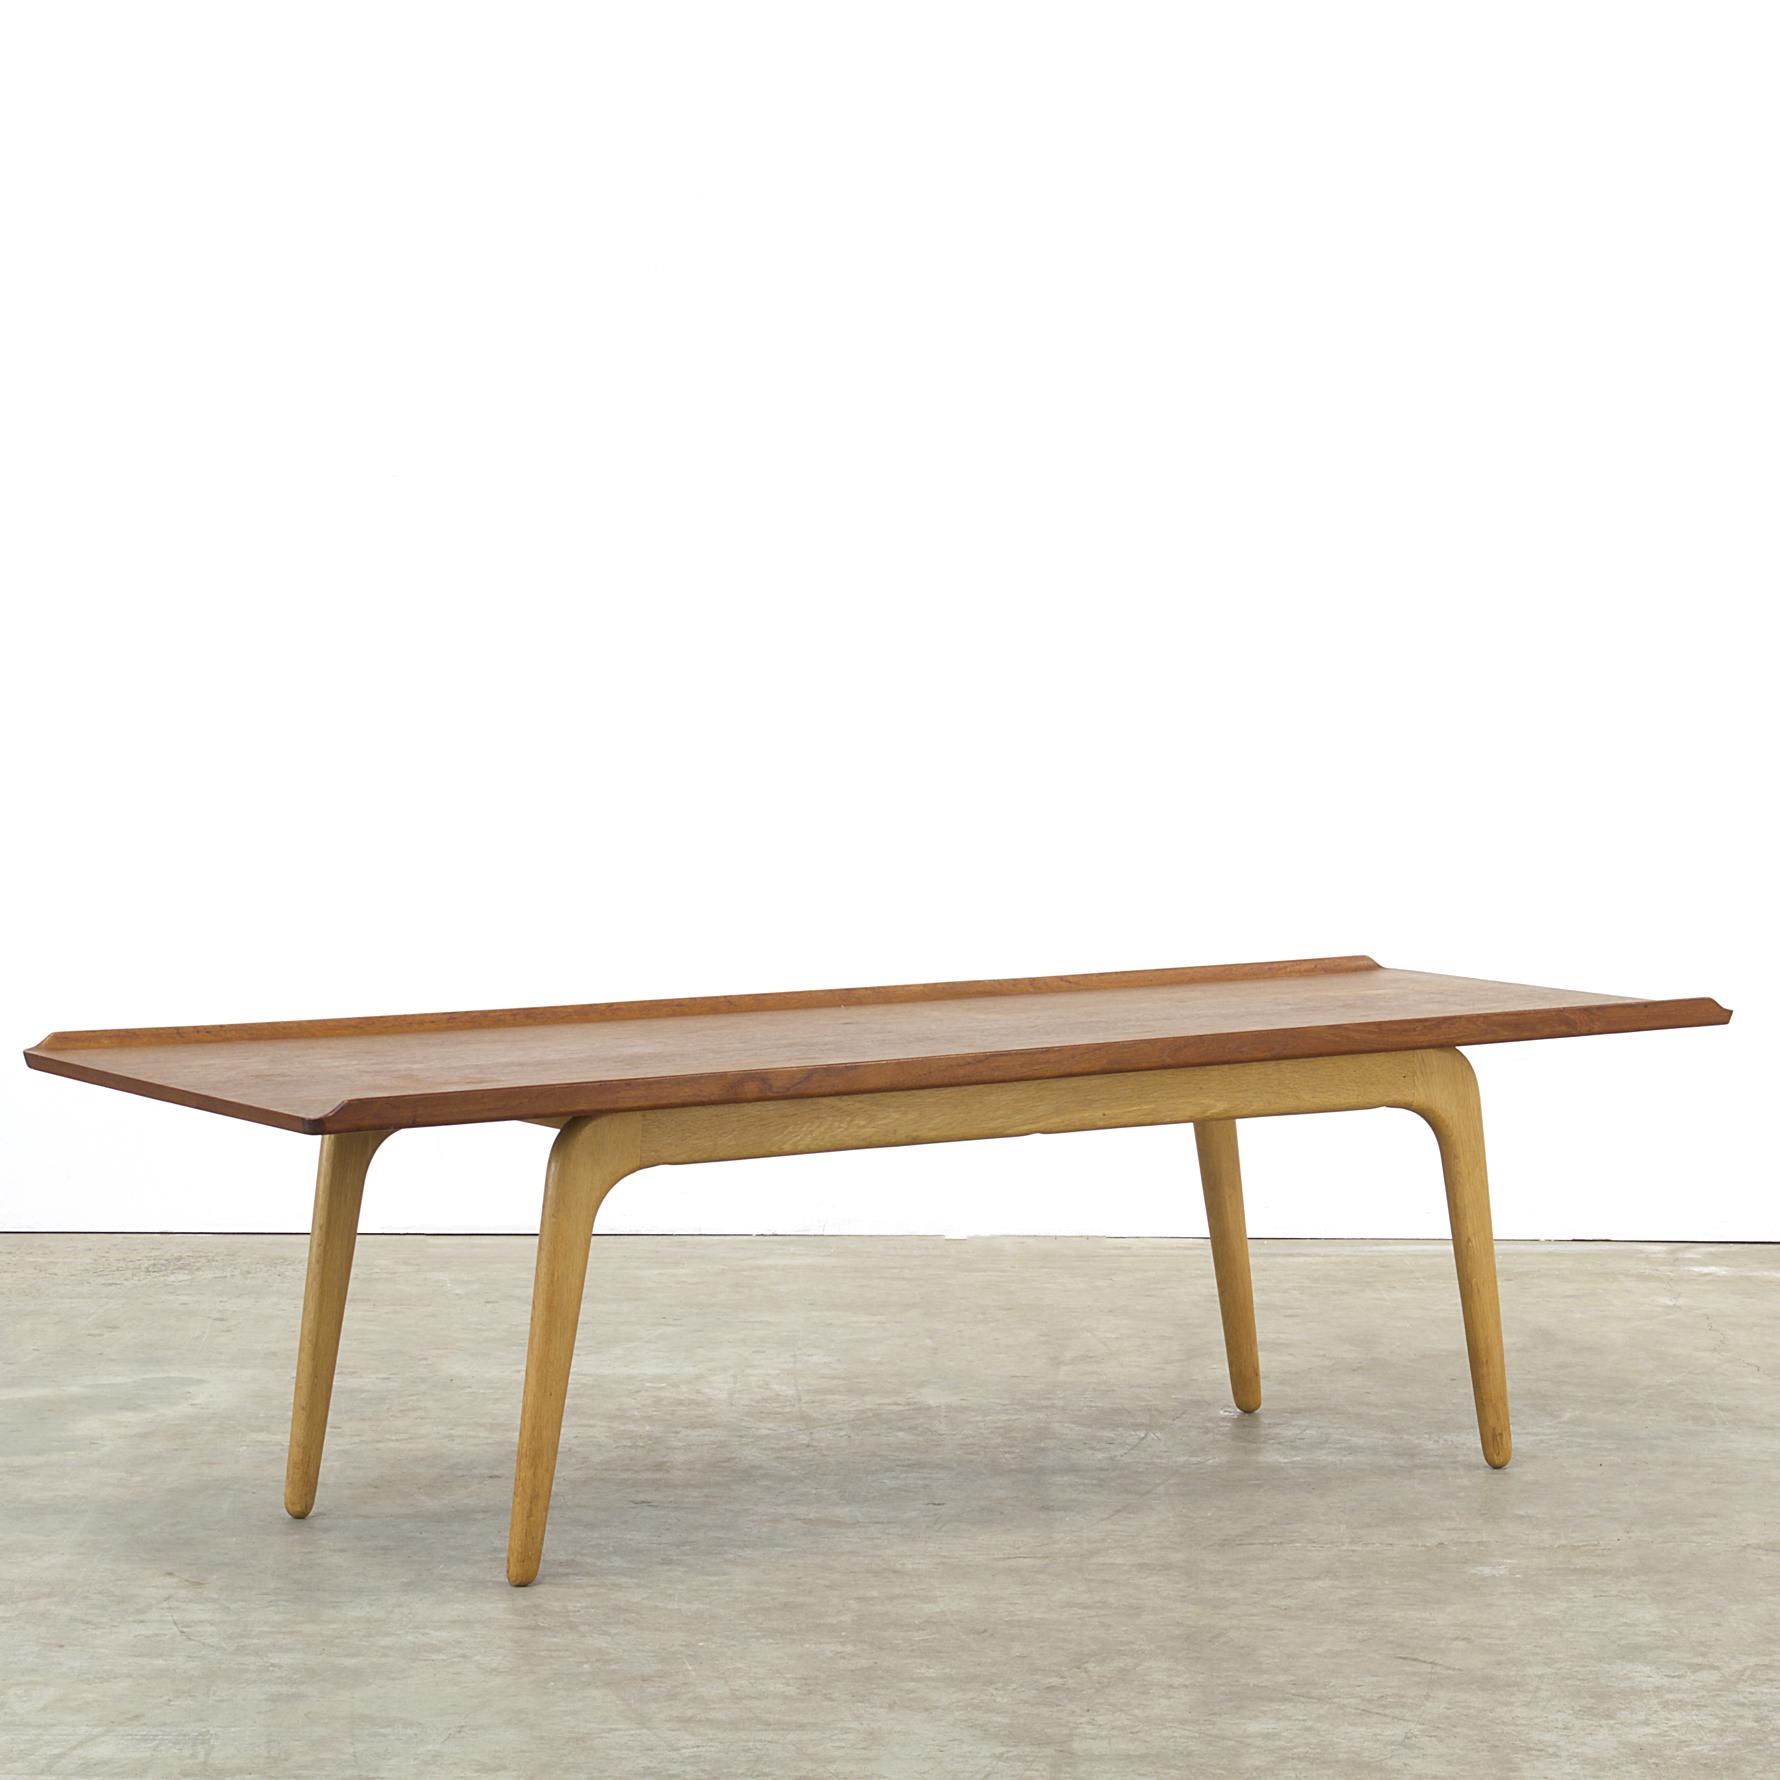 60s Aksel Bender Madsen Coffee Table Teak And Oak For Bovenkamp Barbmama